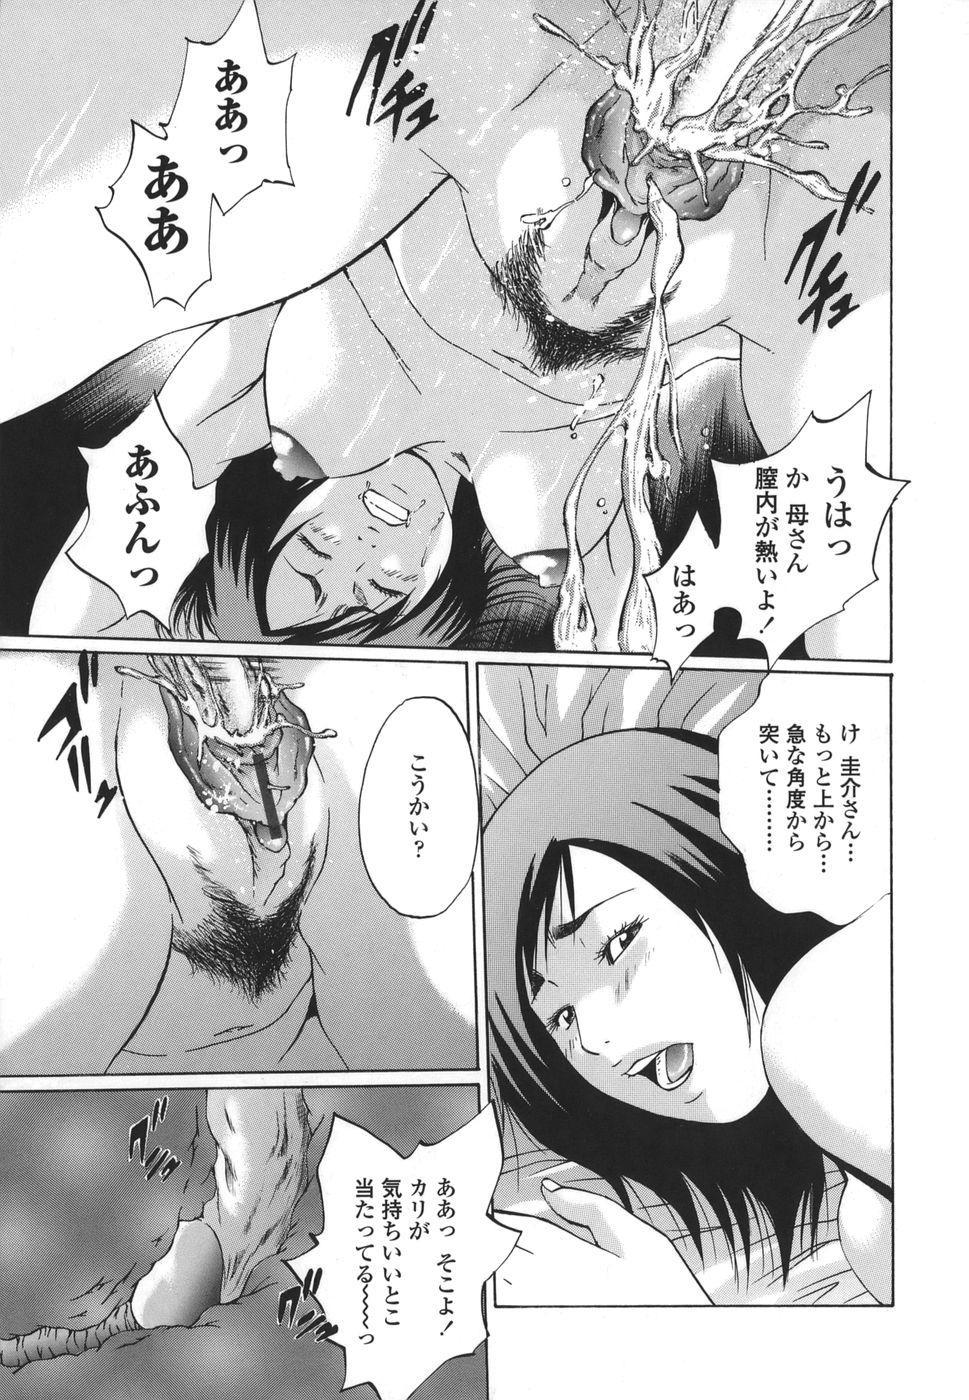 Kinshin Goukan - Near Relation Rapes 32